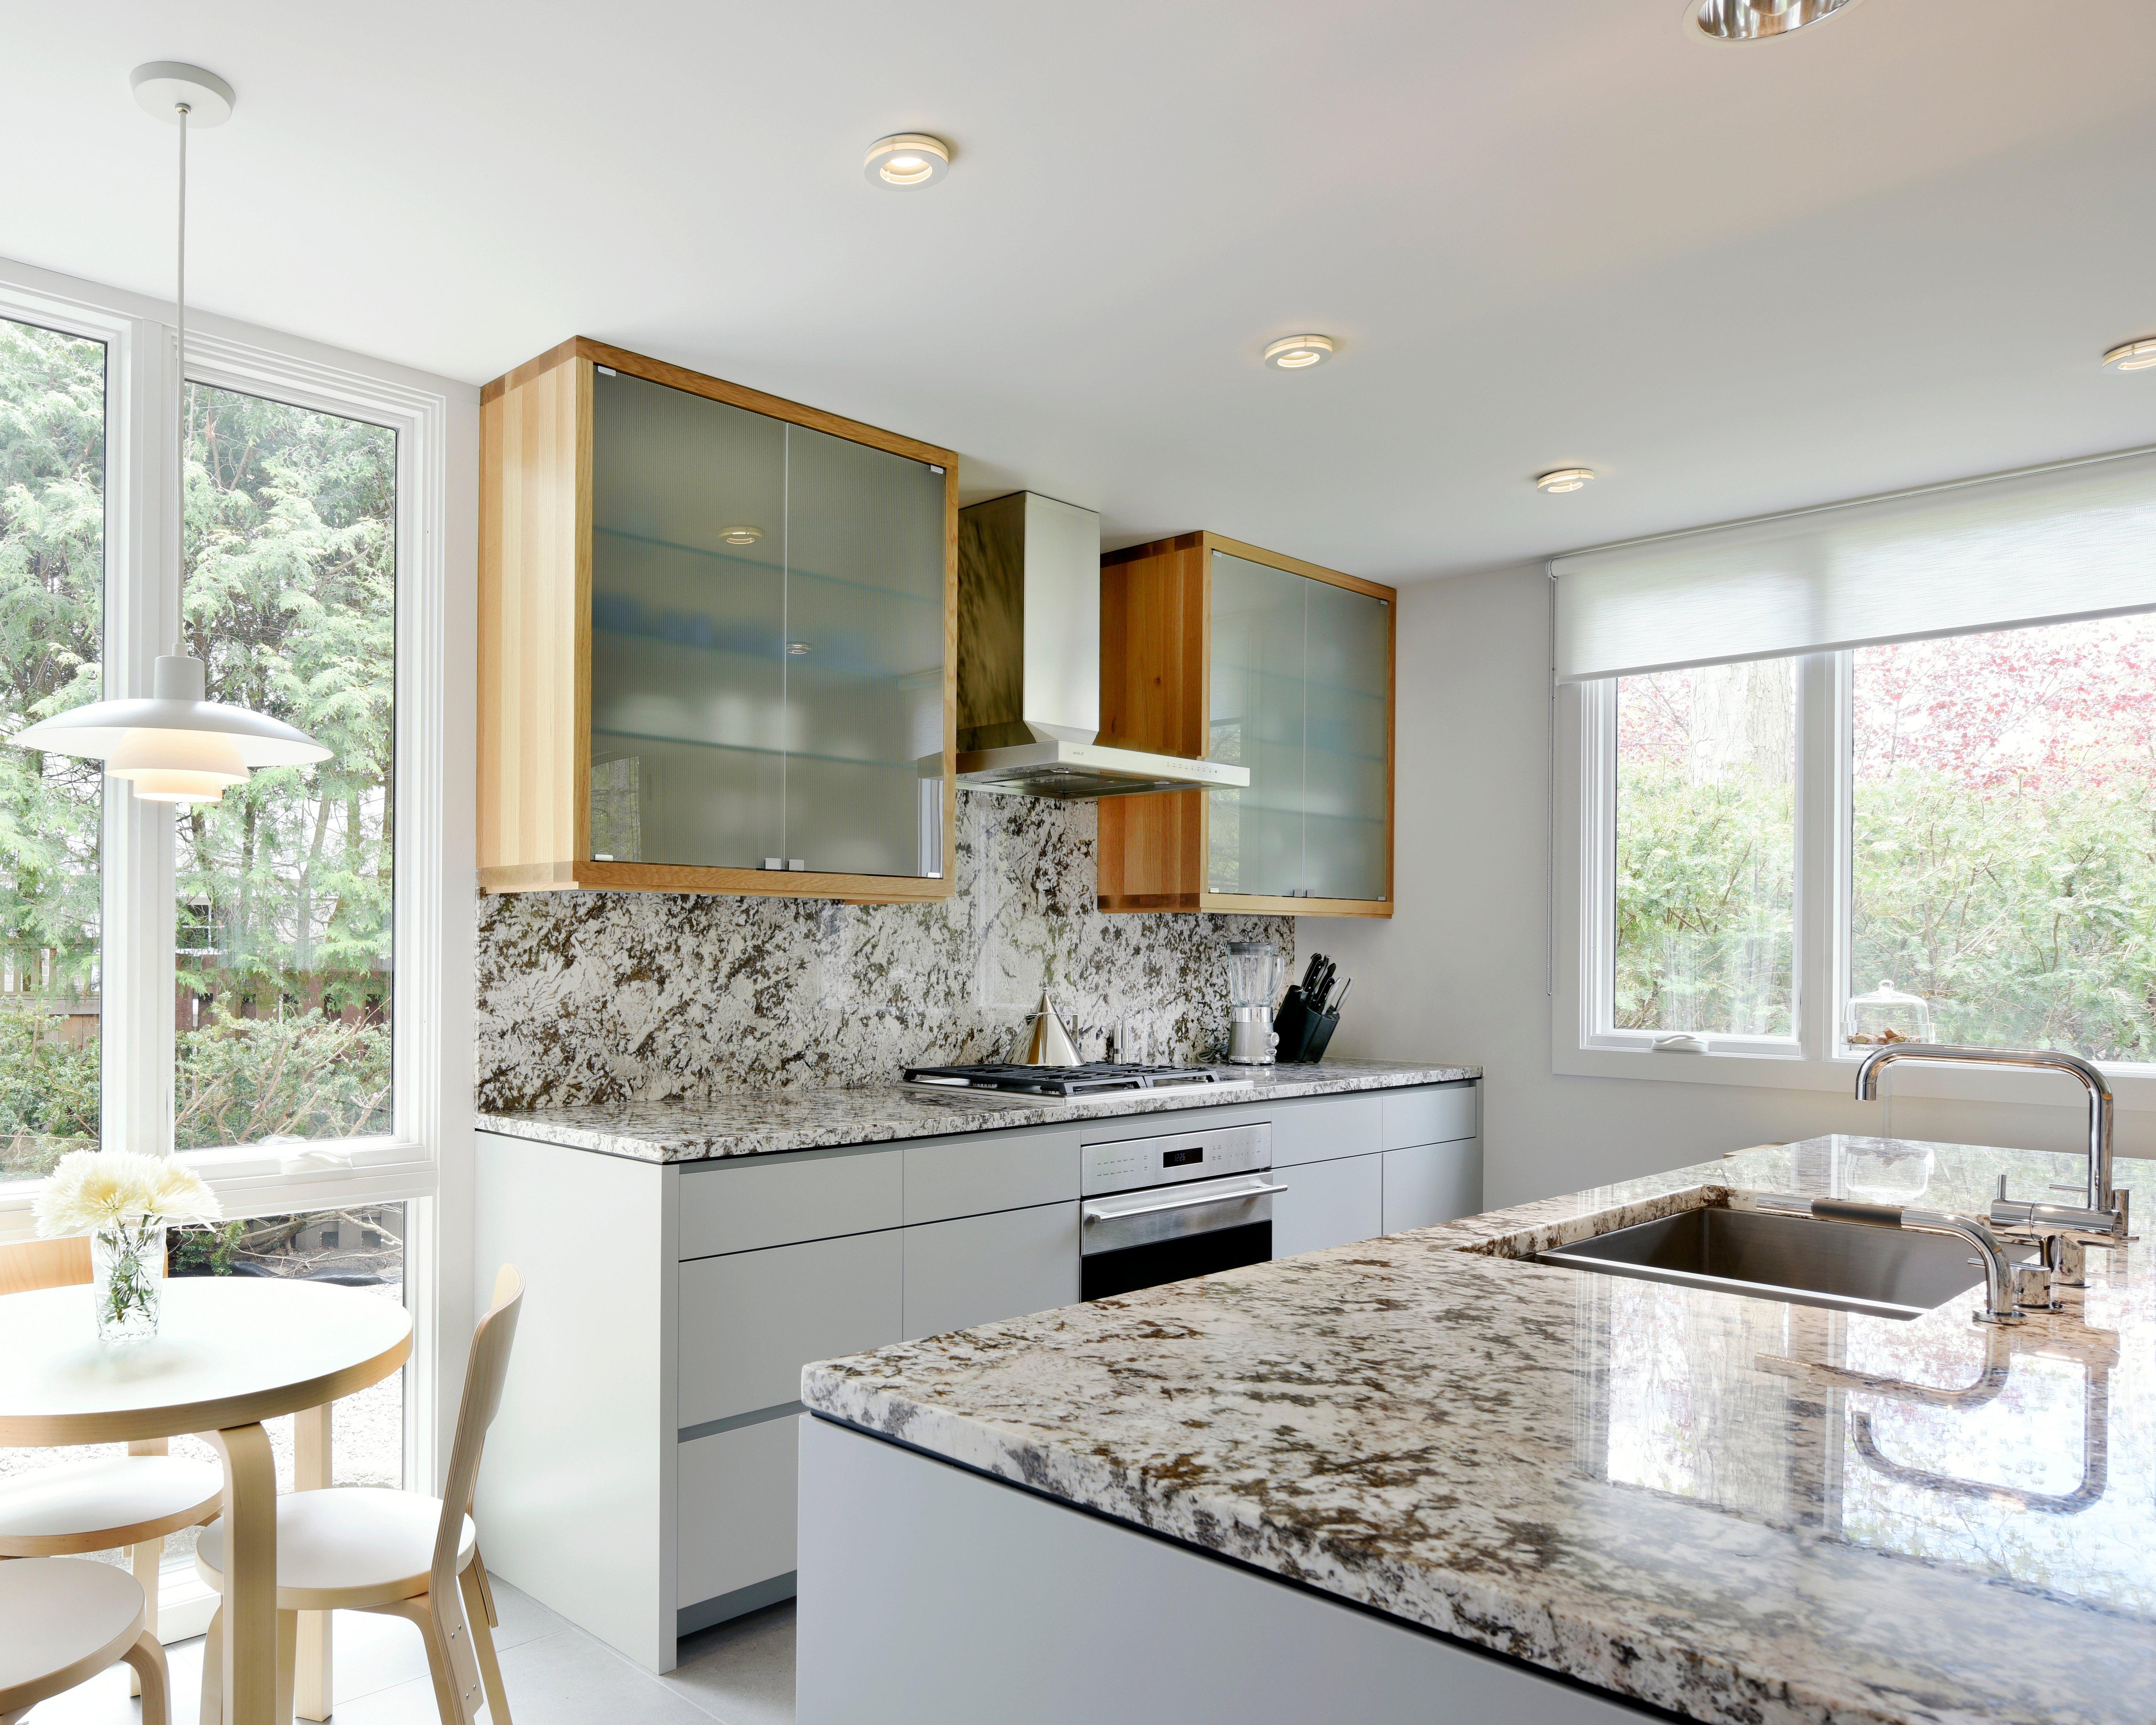 A Deslaurier kitchen design featuring a full-height speckled backsplash.